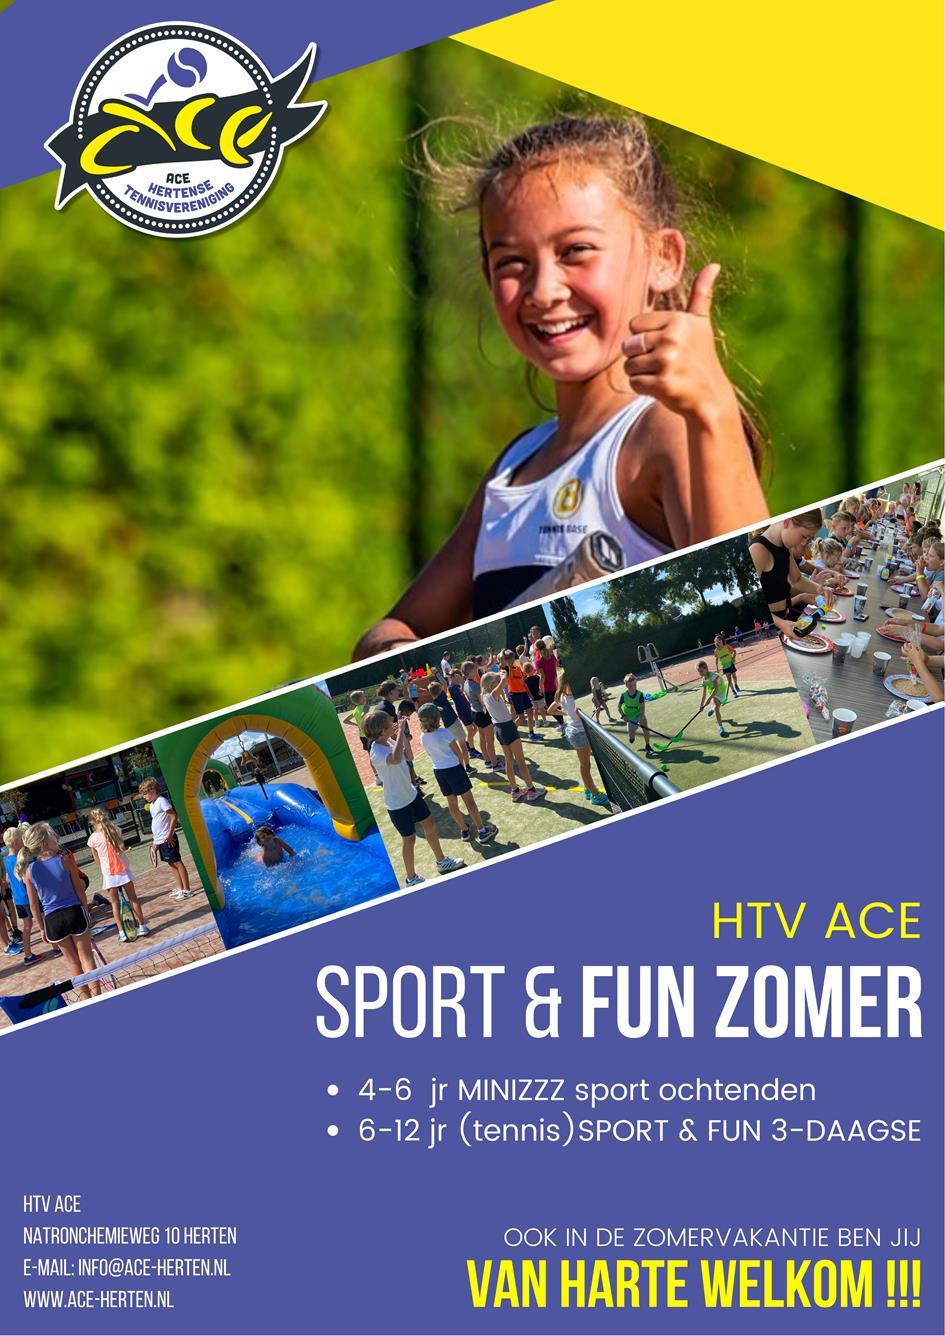 sport&fun zomer jeugd pagina 1.jpg